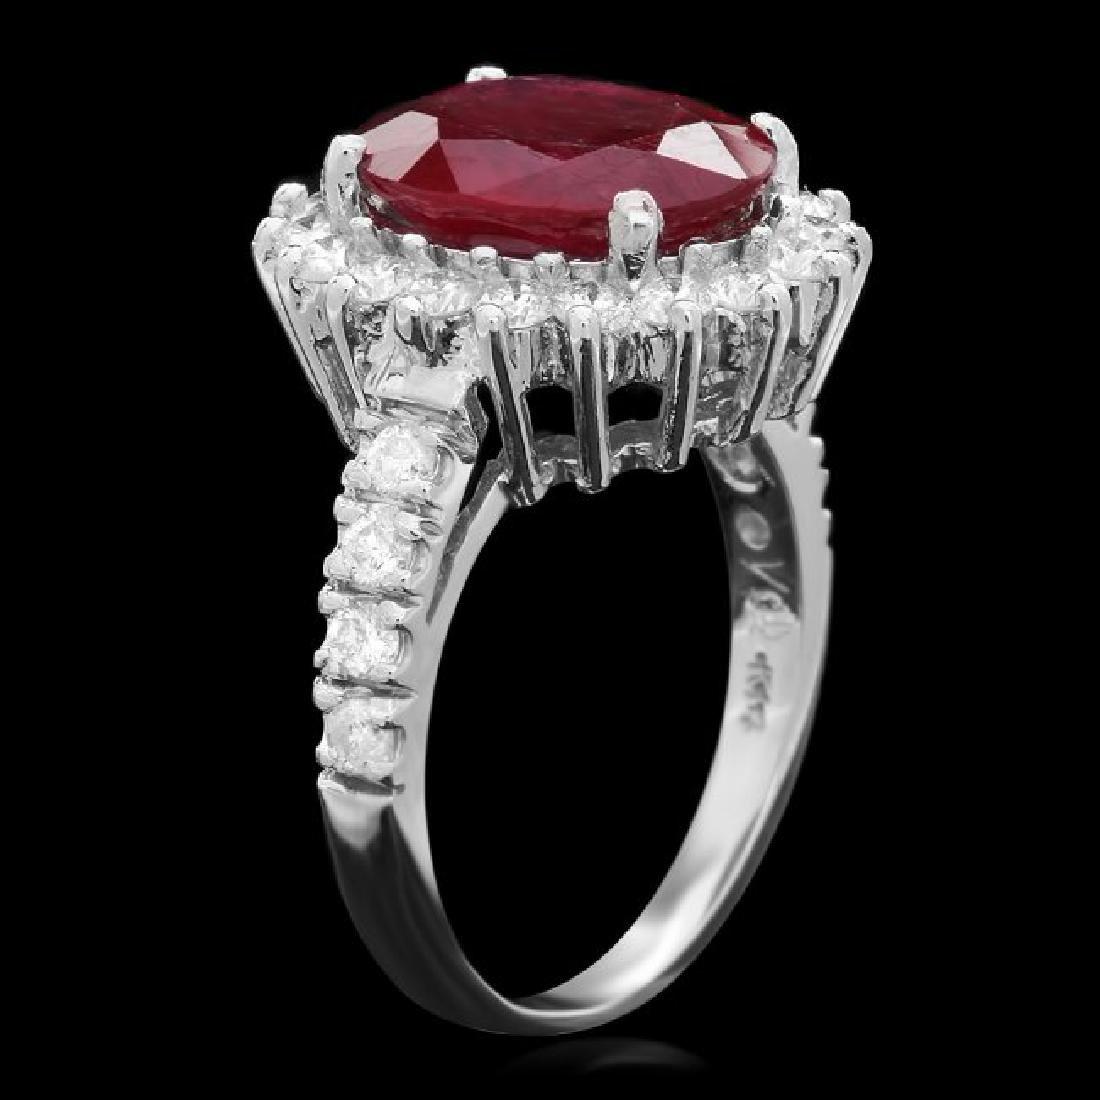 14k White Gold 5.00ct Ruby 1.15ct Diamond Ring - 2